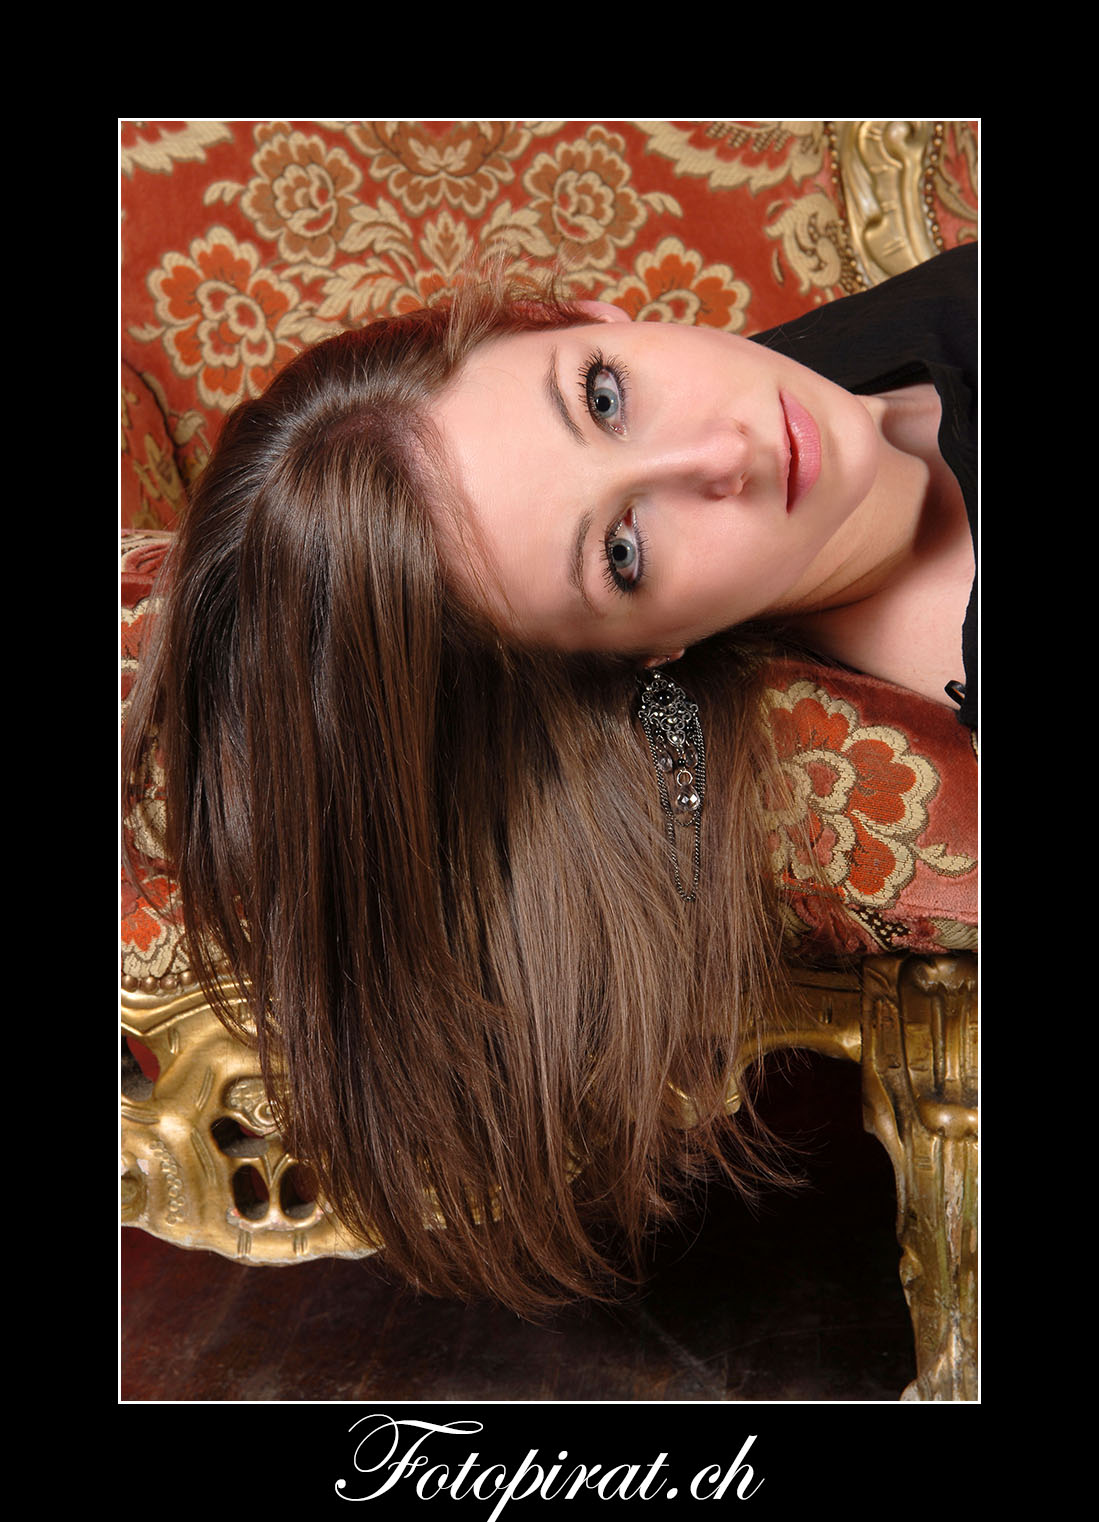 Fotoshooting, On Location, schöne Augen, Modelagentur, Barock, Fotomodel